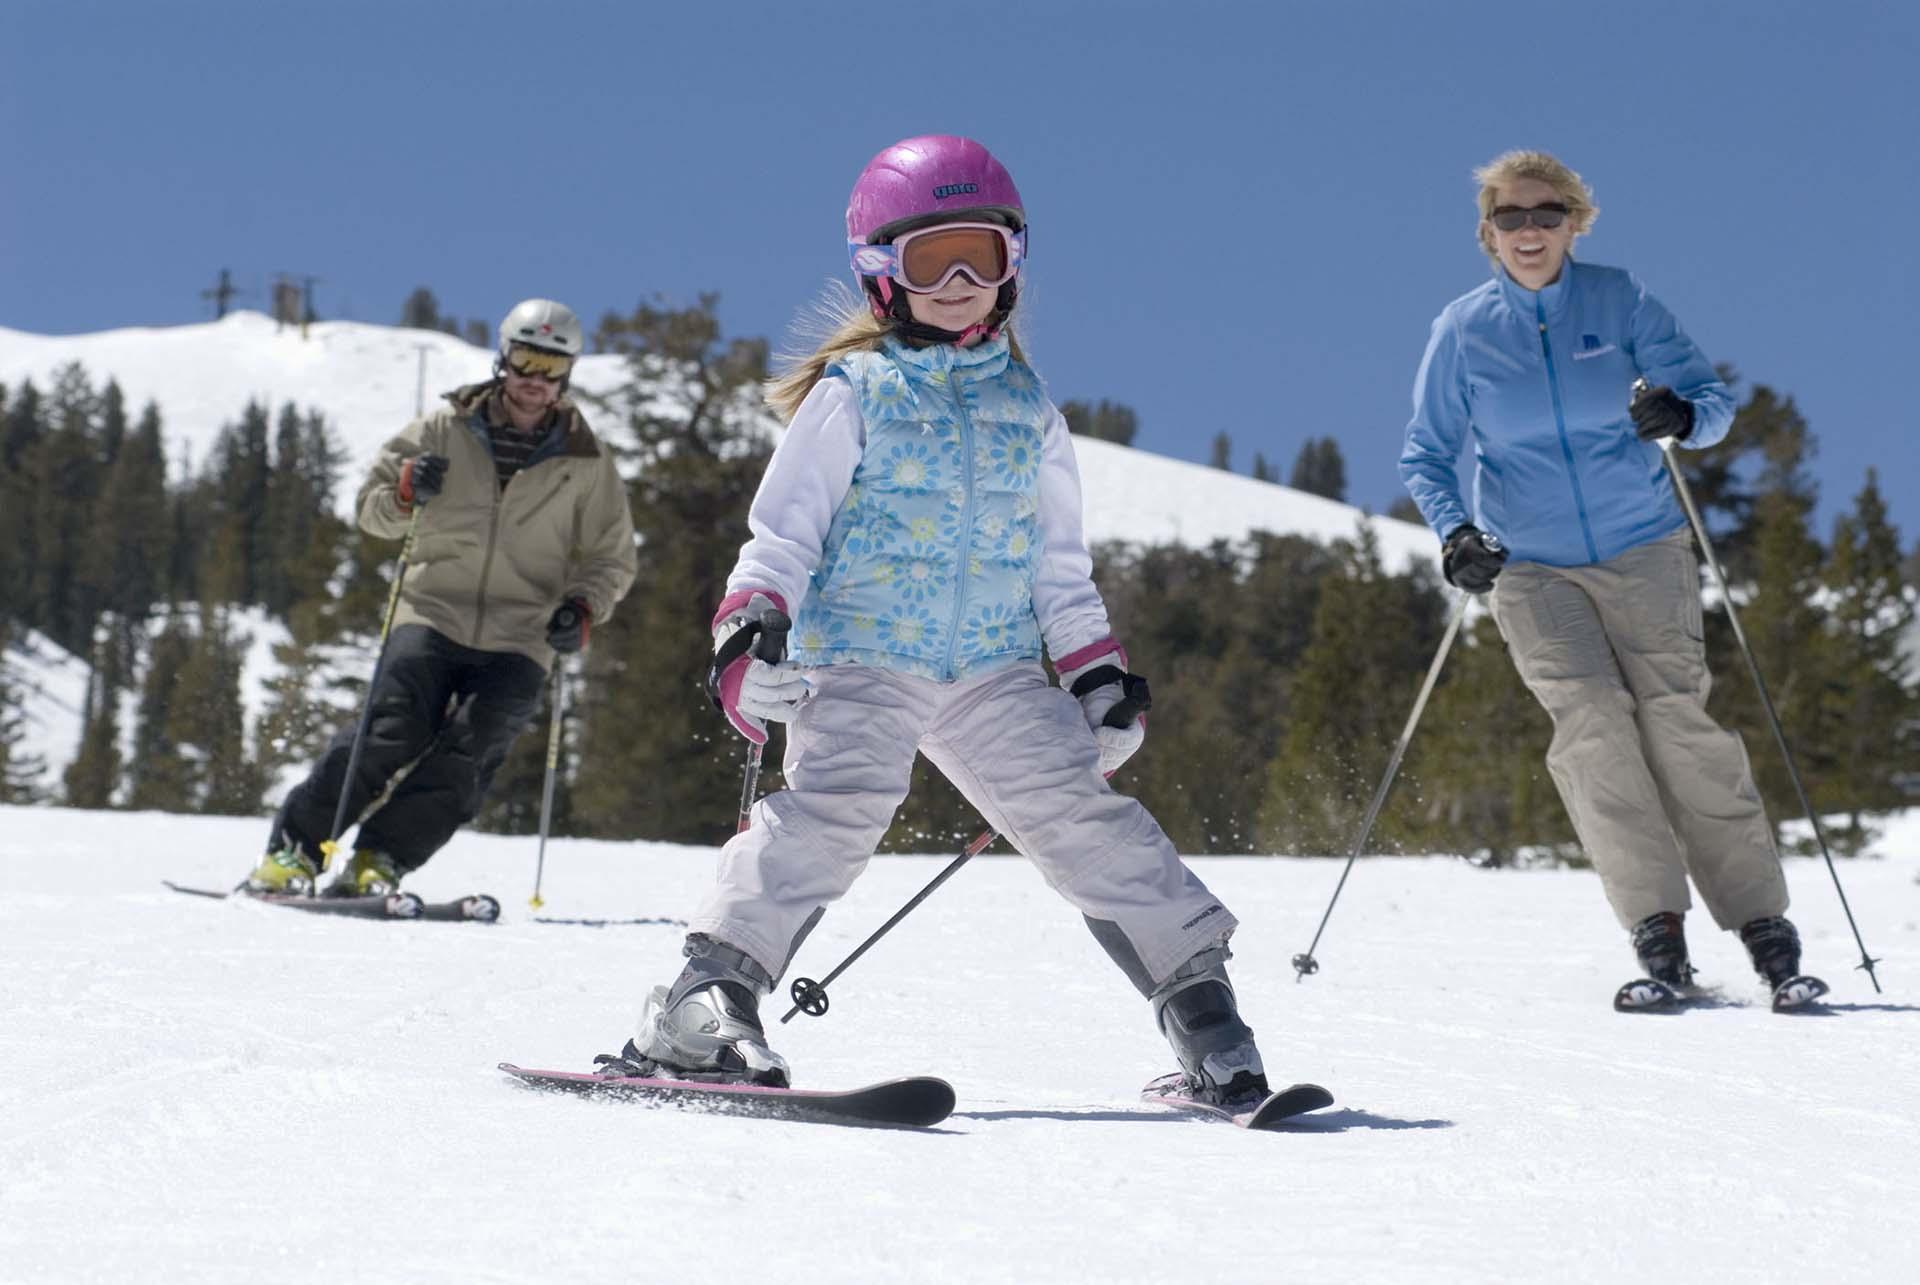 pratica de esqui no lee canyon snowboarding las vegas ski resort